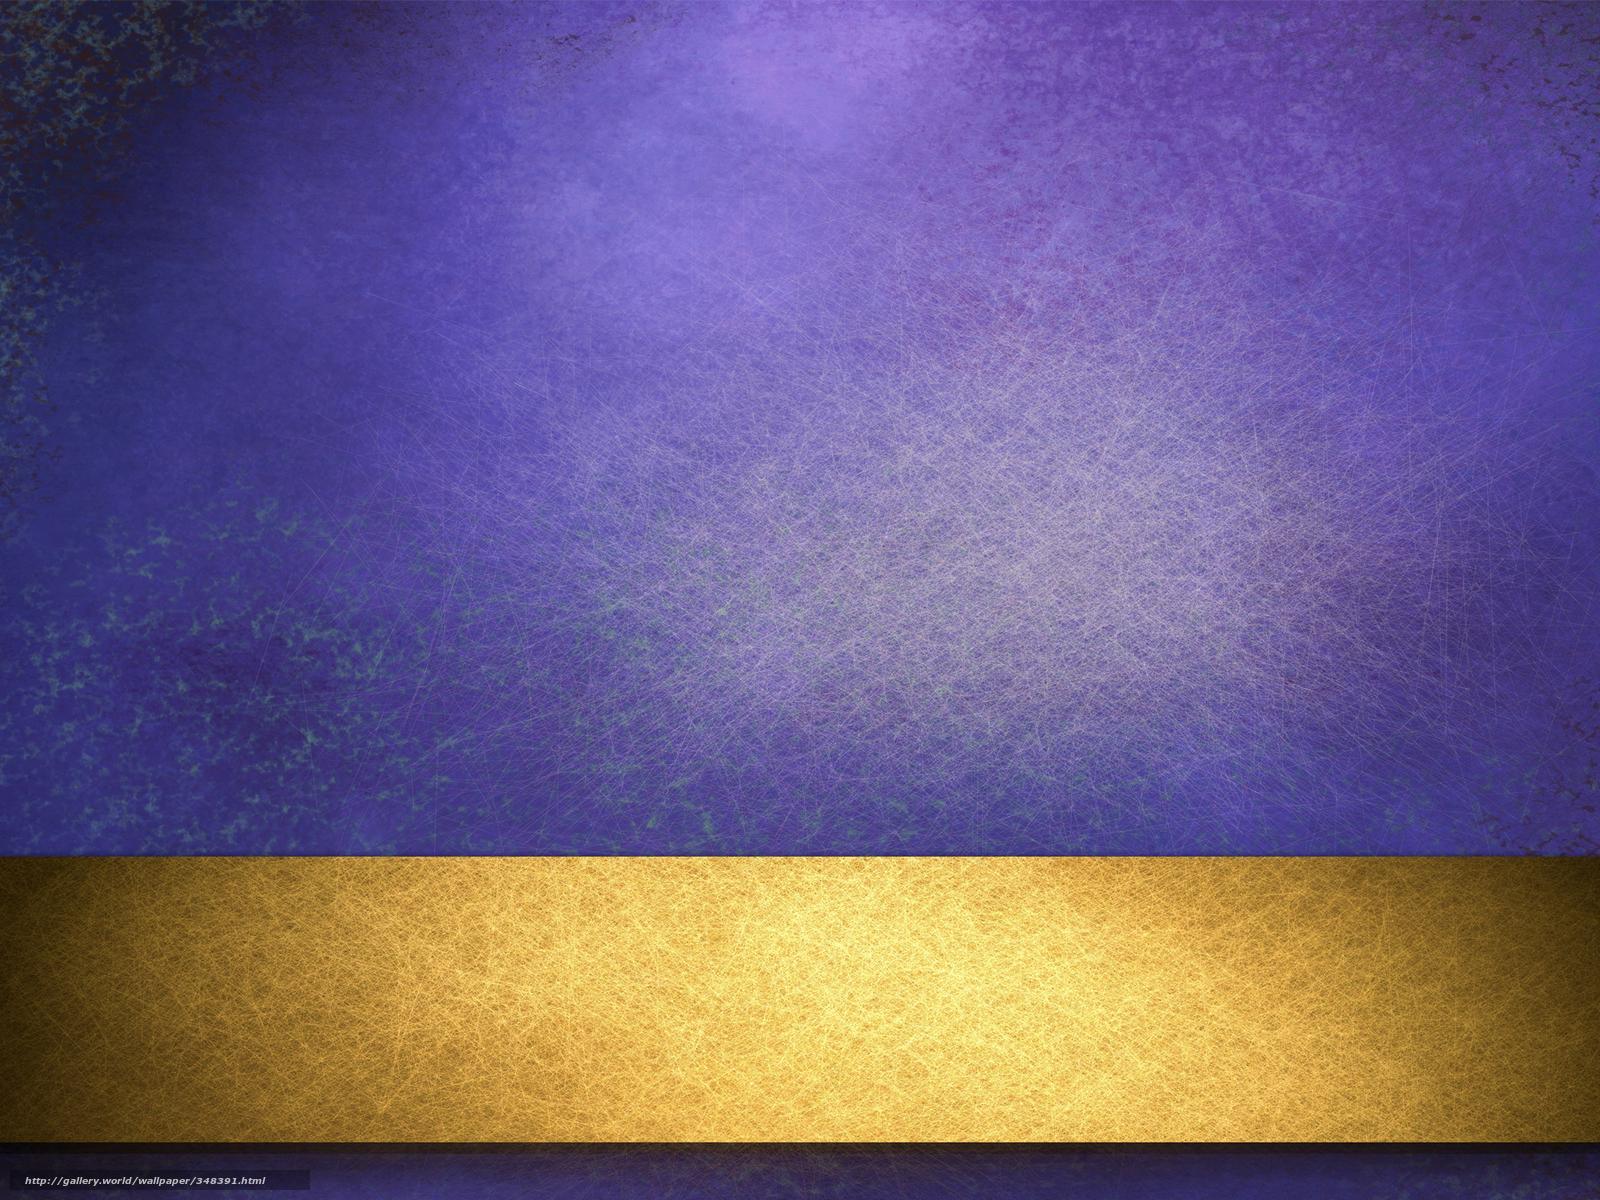 wallpaper purple gold stains scratches desktop wallpaper 1600x1200